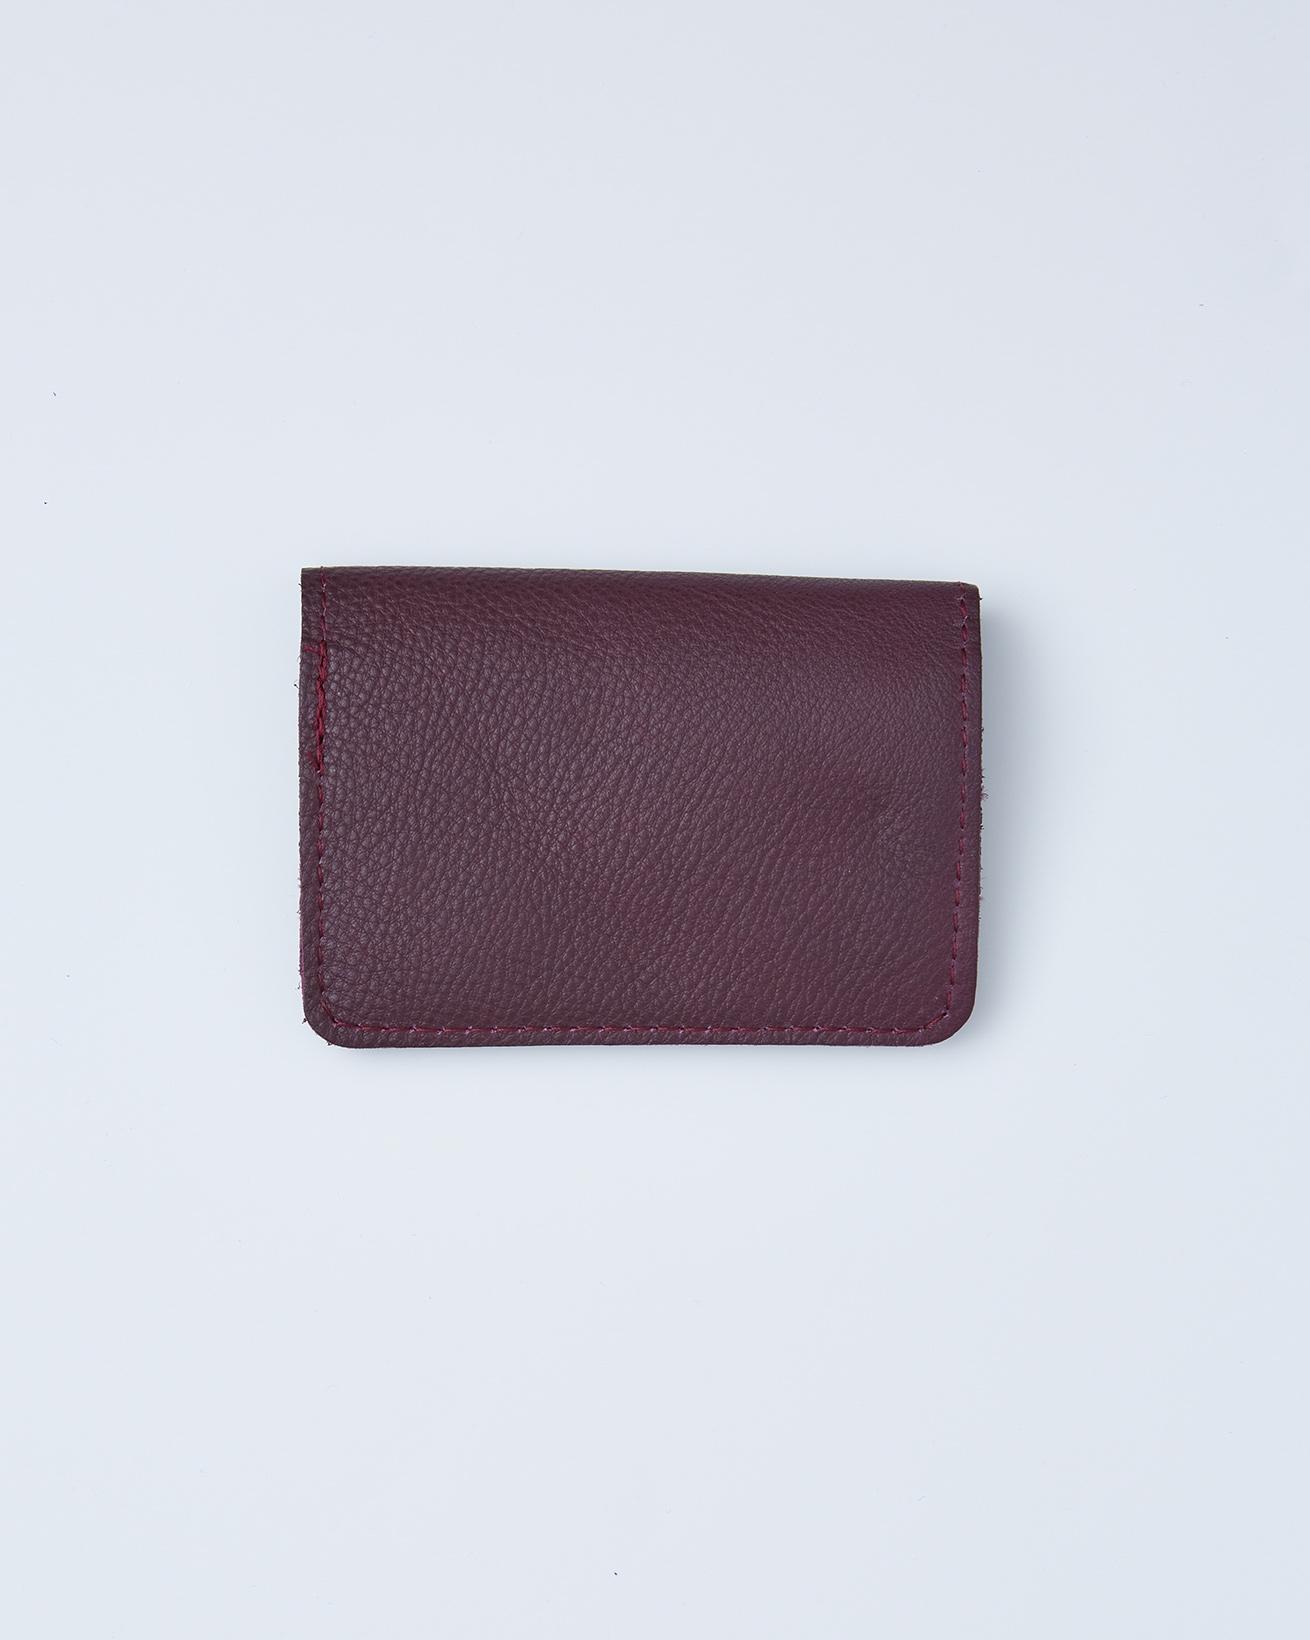 Leather Flip Open Card Wallet - One/Size -  Damson - 2407